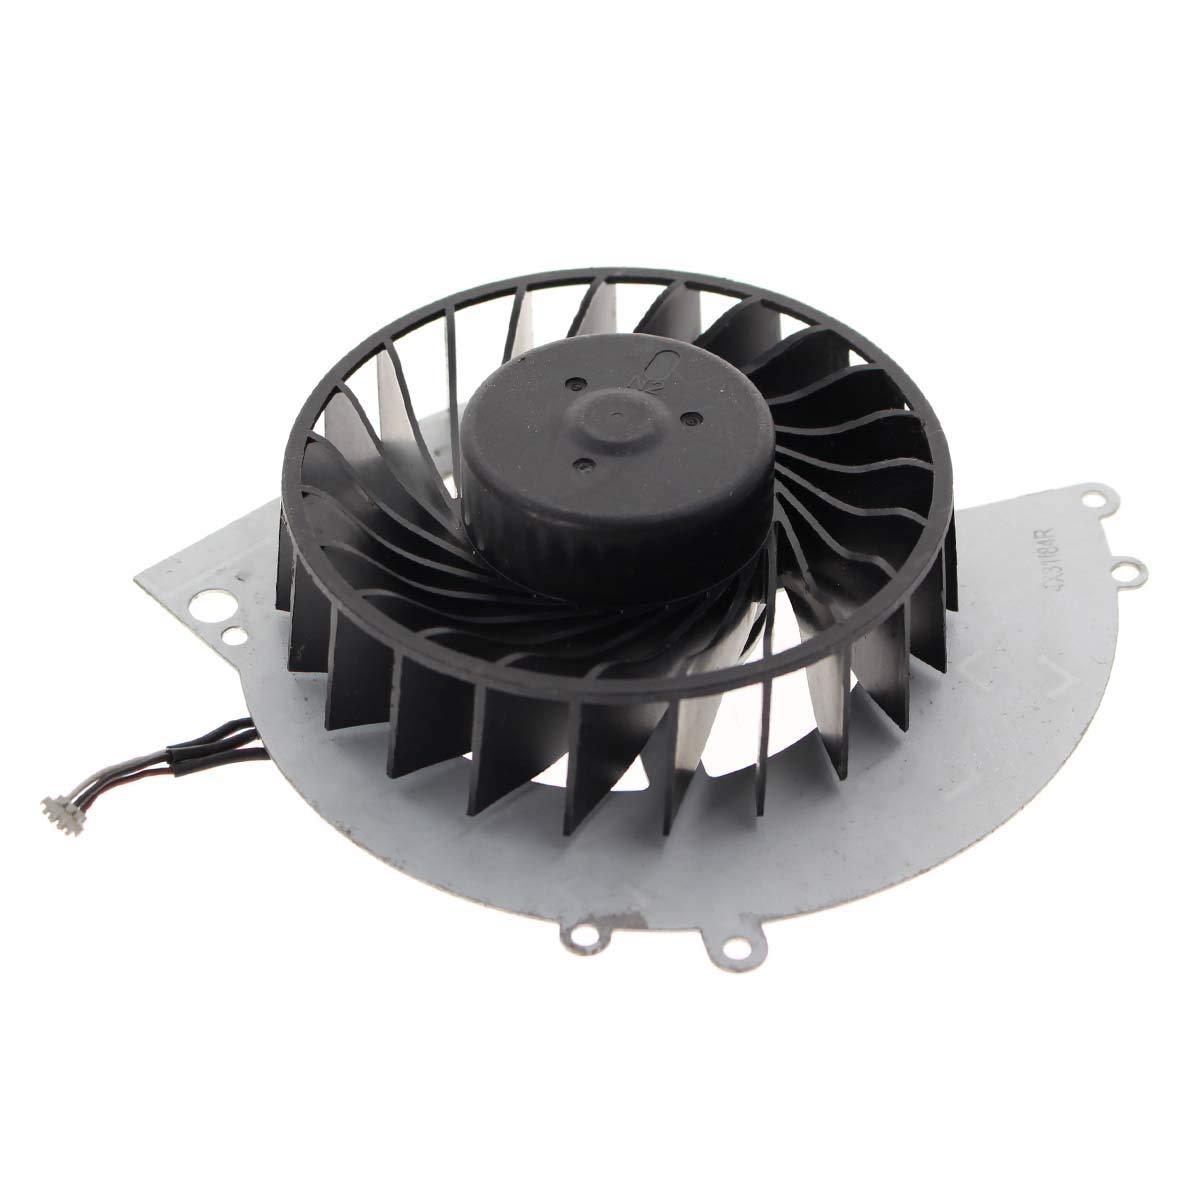 Autokay Internal Cpu Cooling Fan Part Para Sony Ps4 Cuh-1...